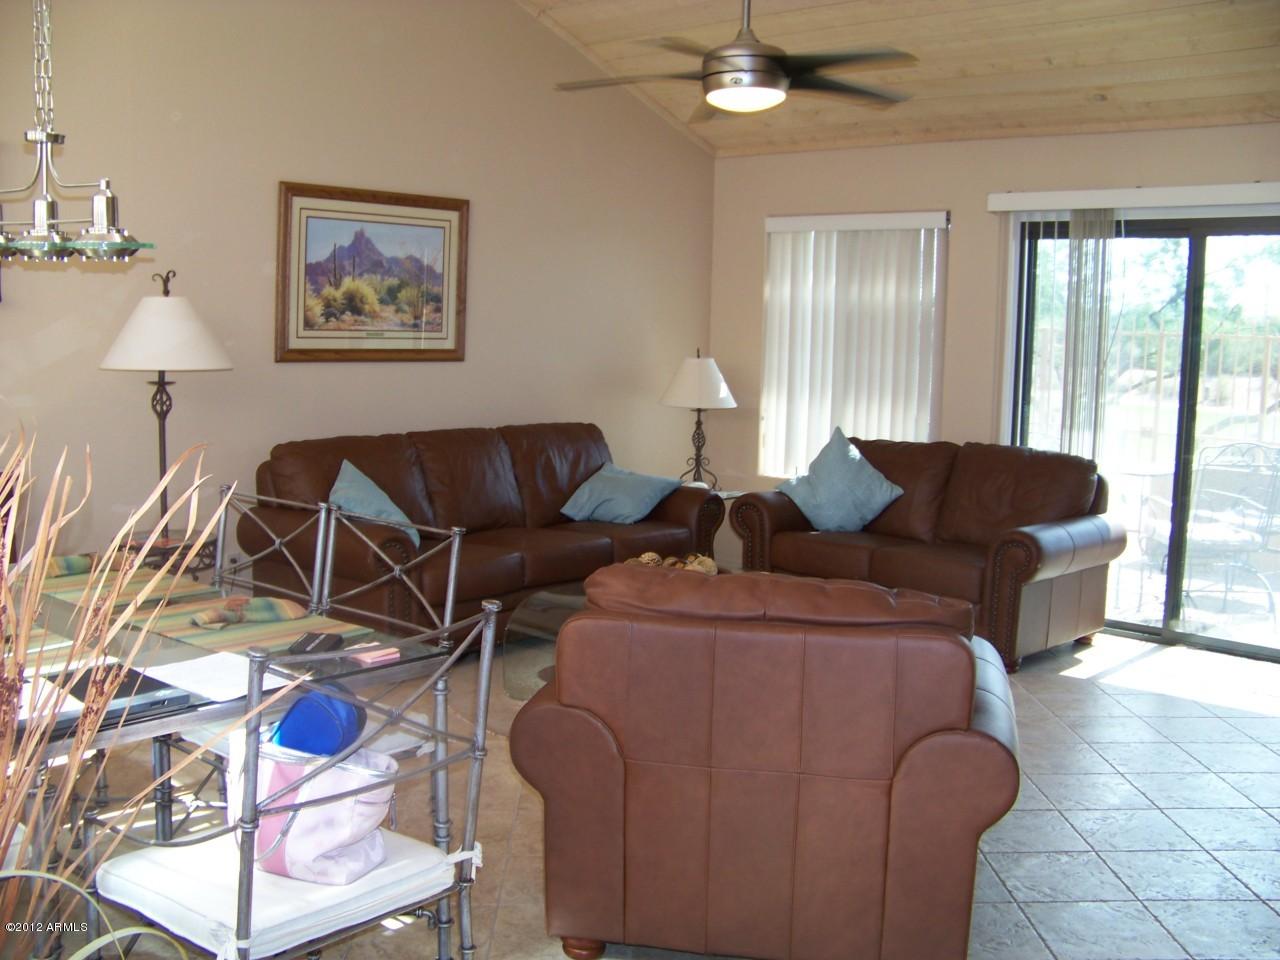 7901 E Joshua Tree Lane, Unit 10, Scottsdale AZ 85250 - Photo 2